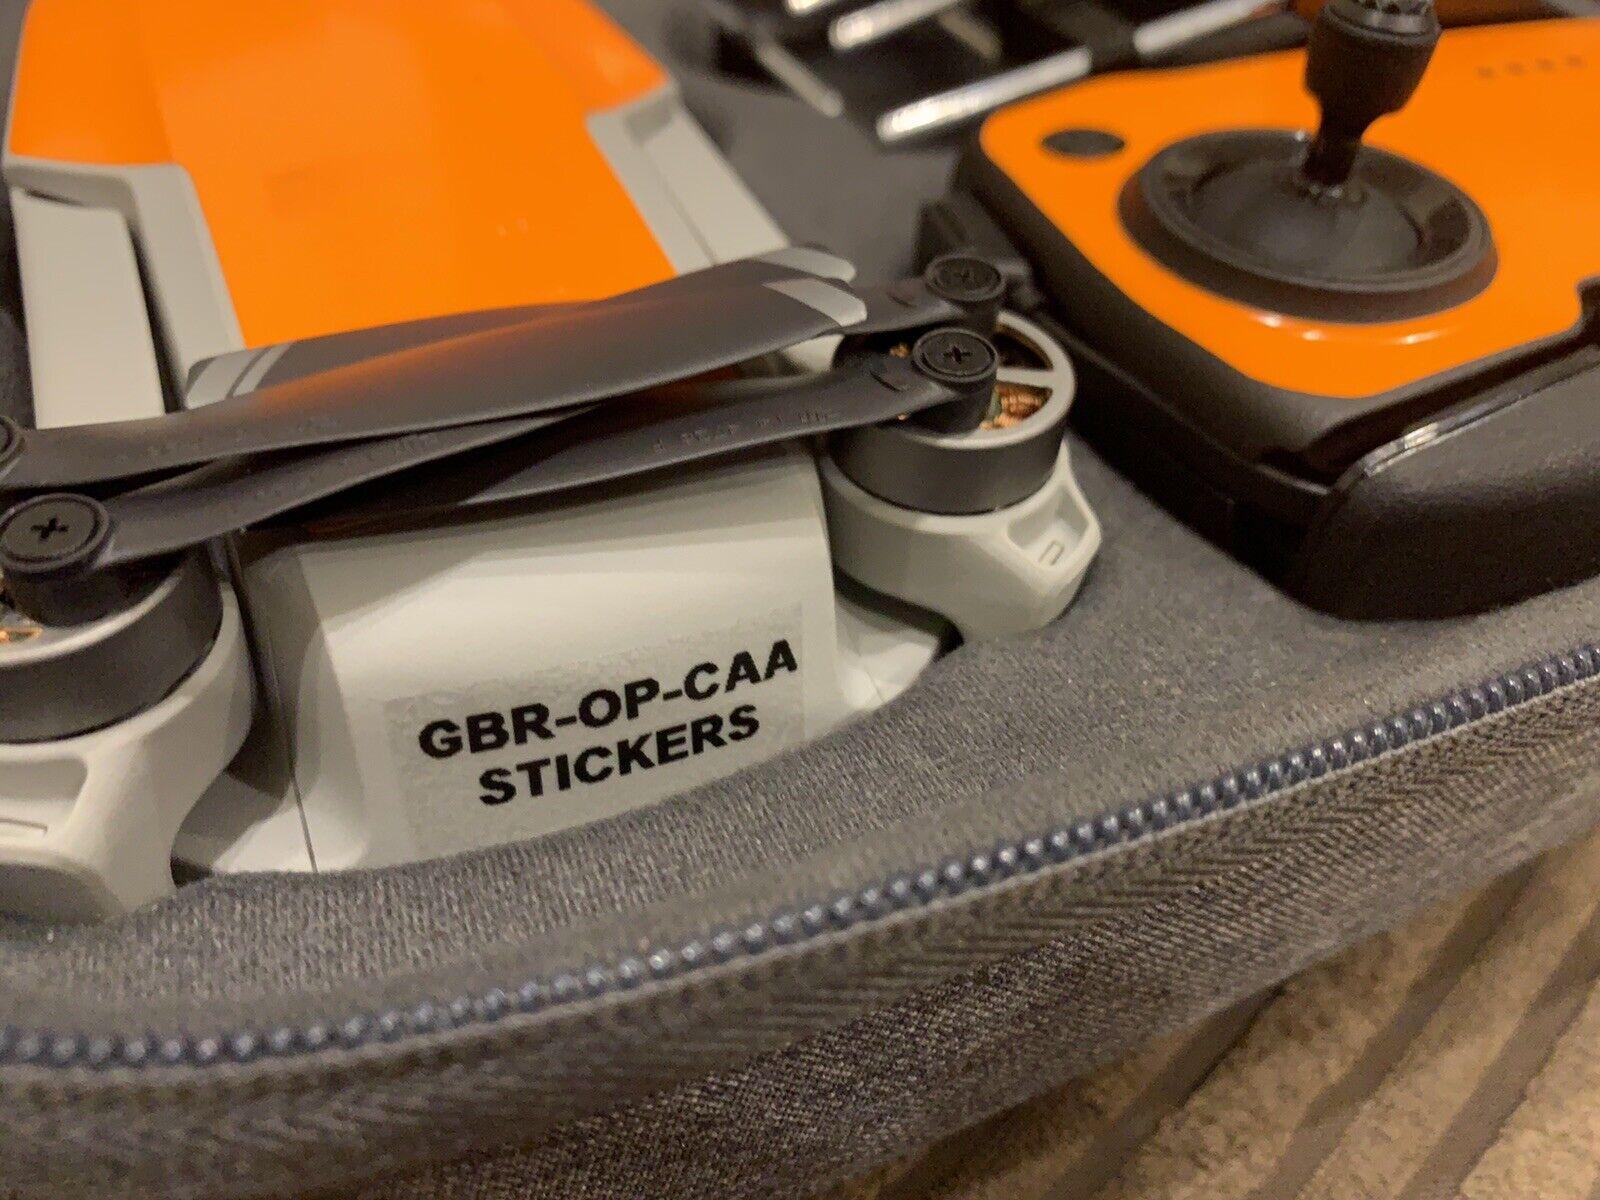 5x Clear Drone Operator ID Labels UK CAA Regulatory Stickers - DJI MAVIC MINI